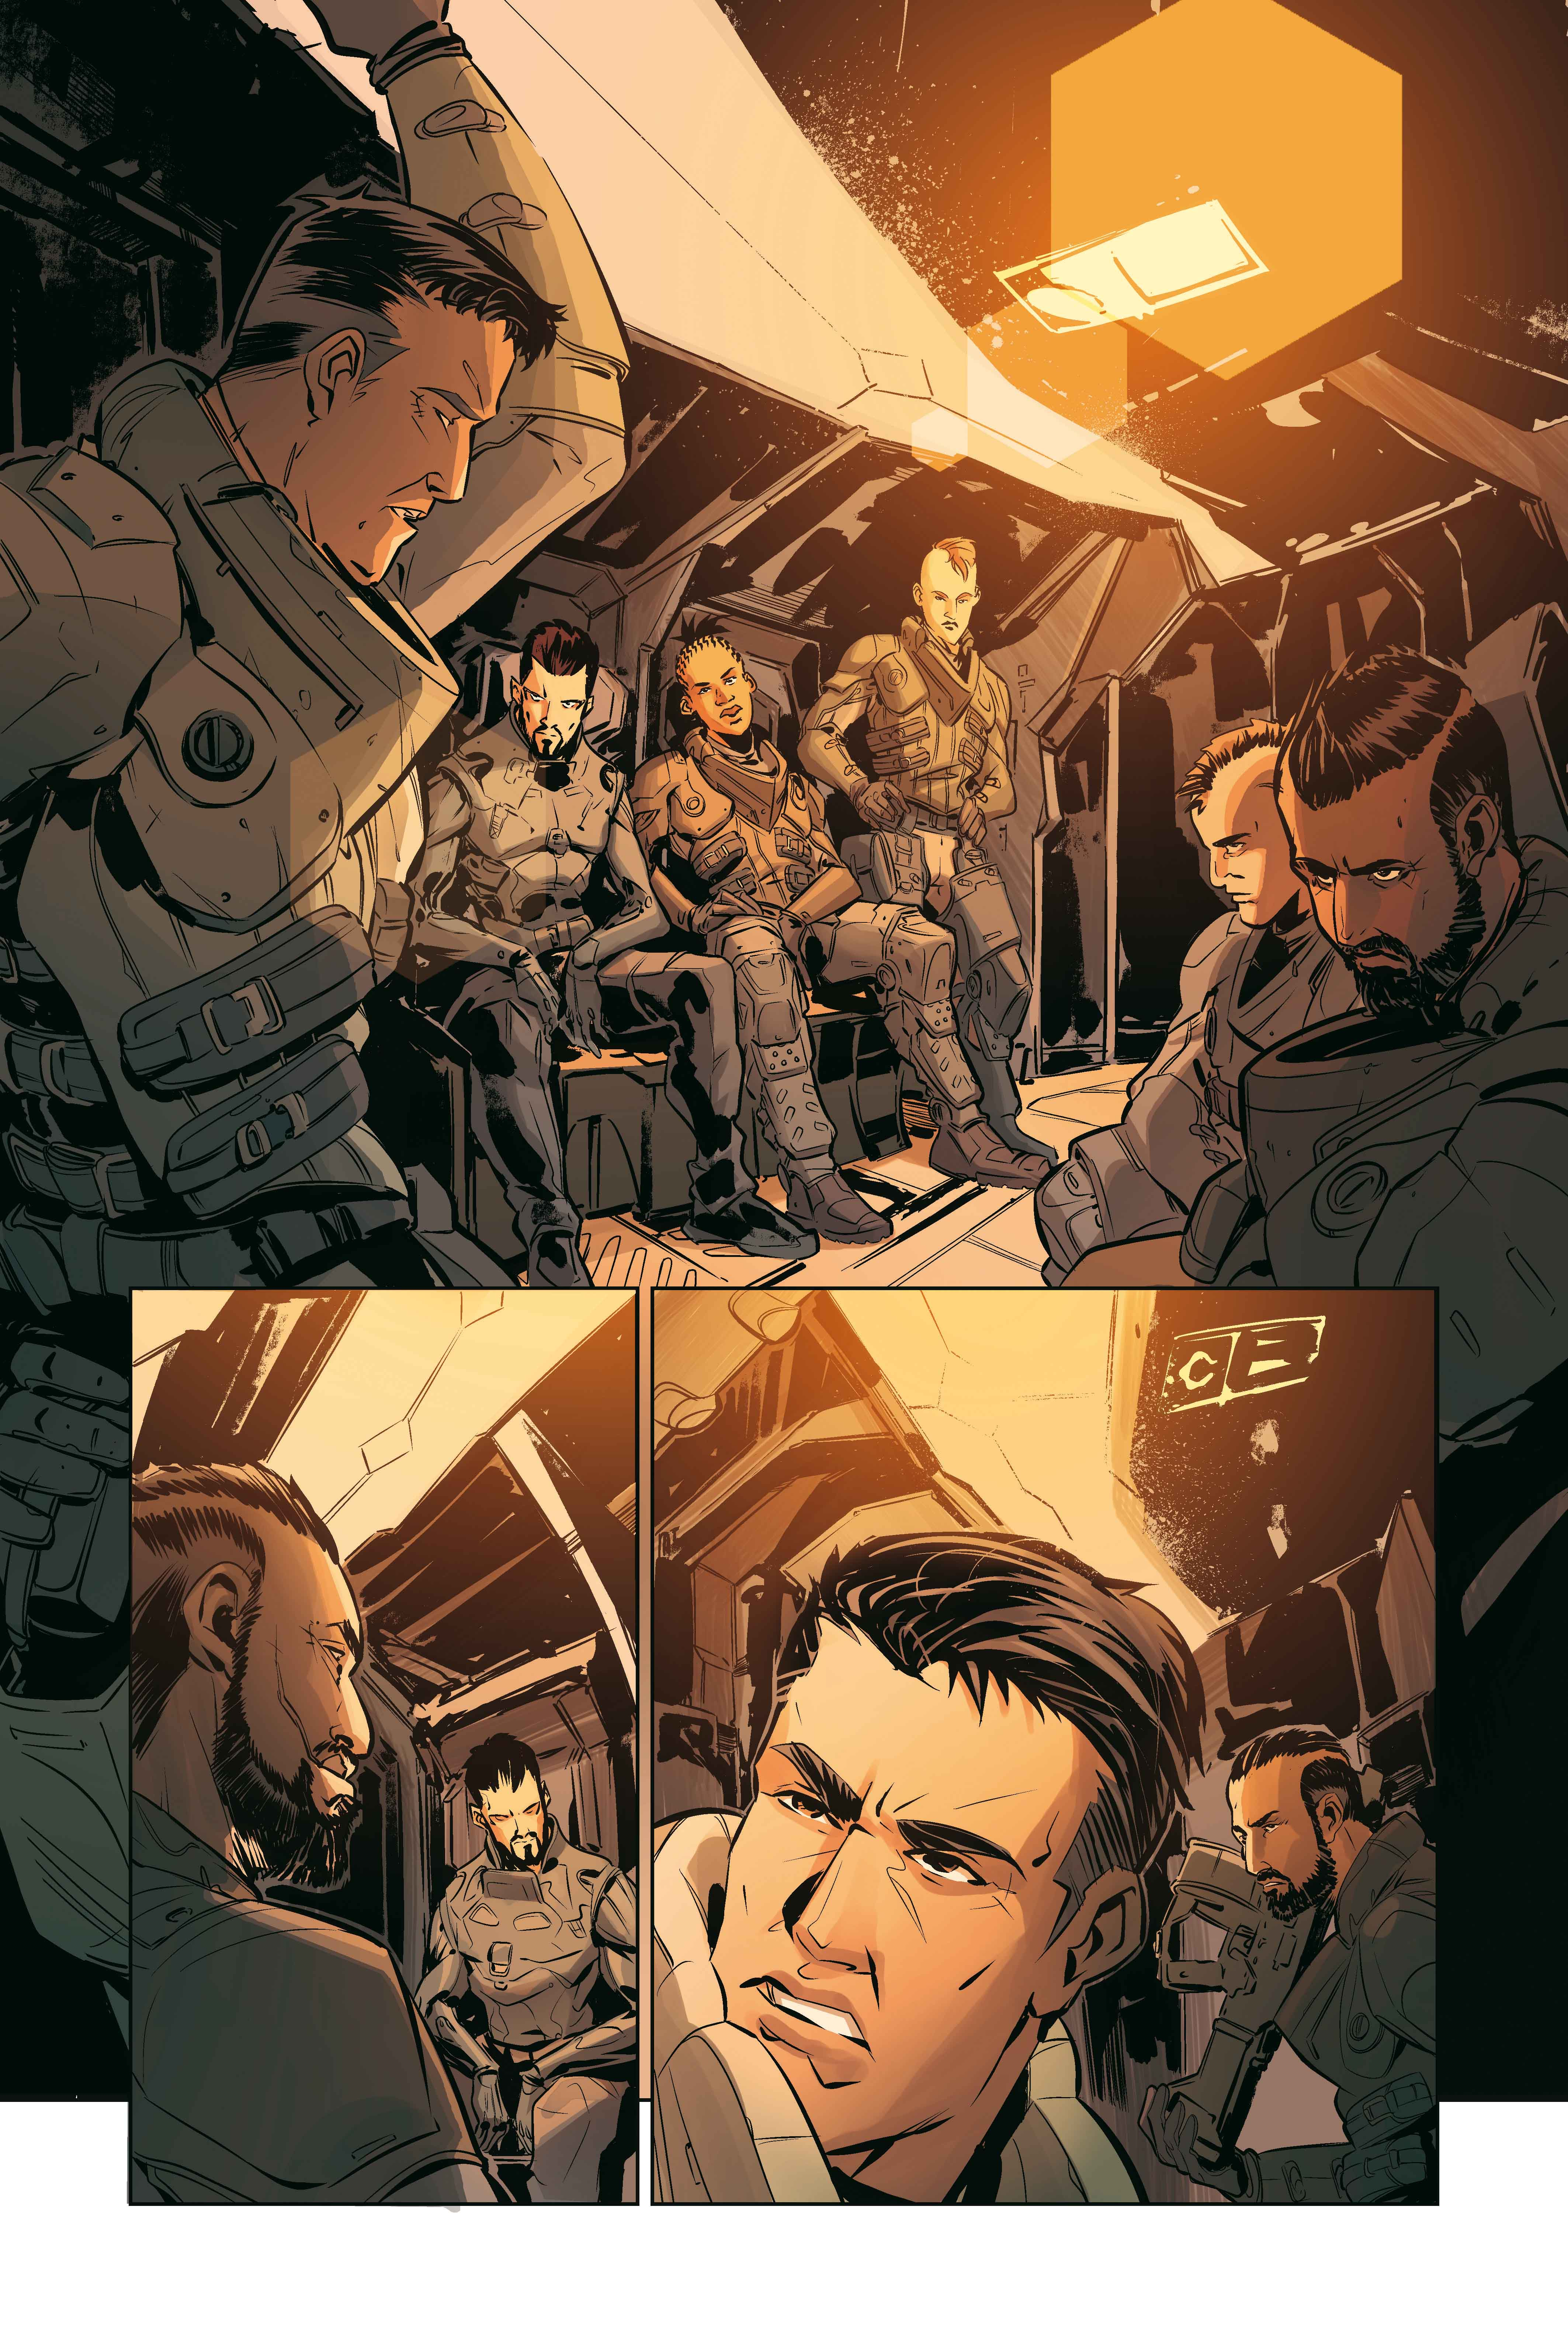 Deus Ex Universe: Children's Crusade #1 First Look